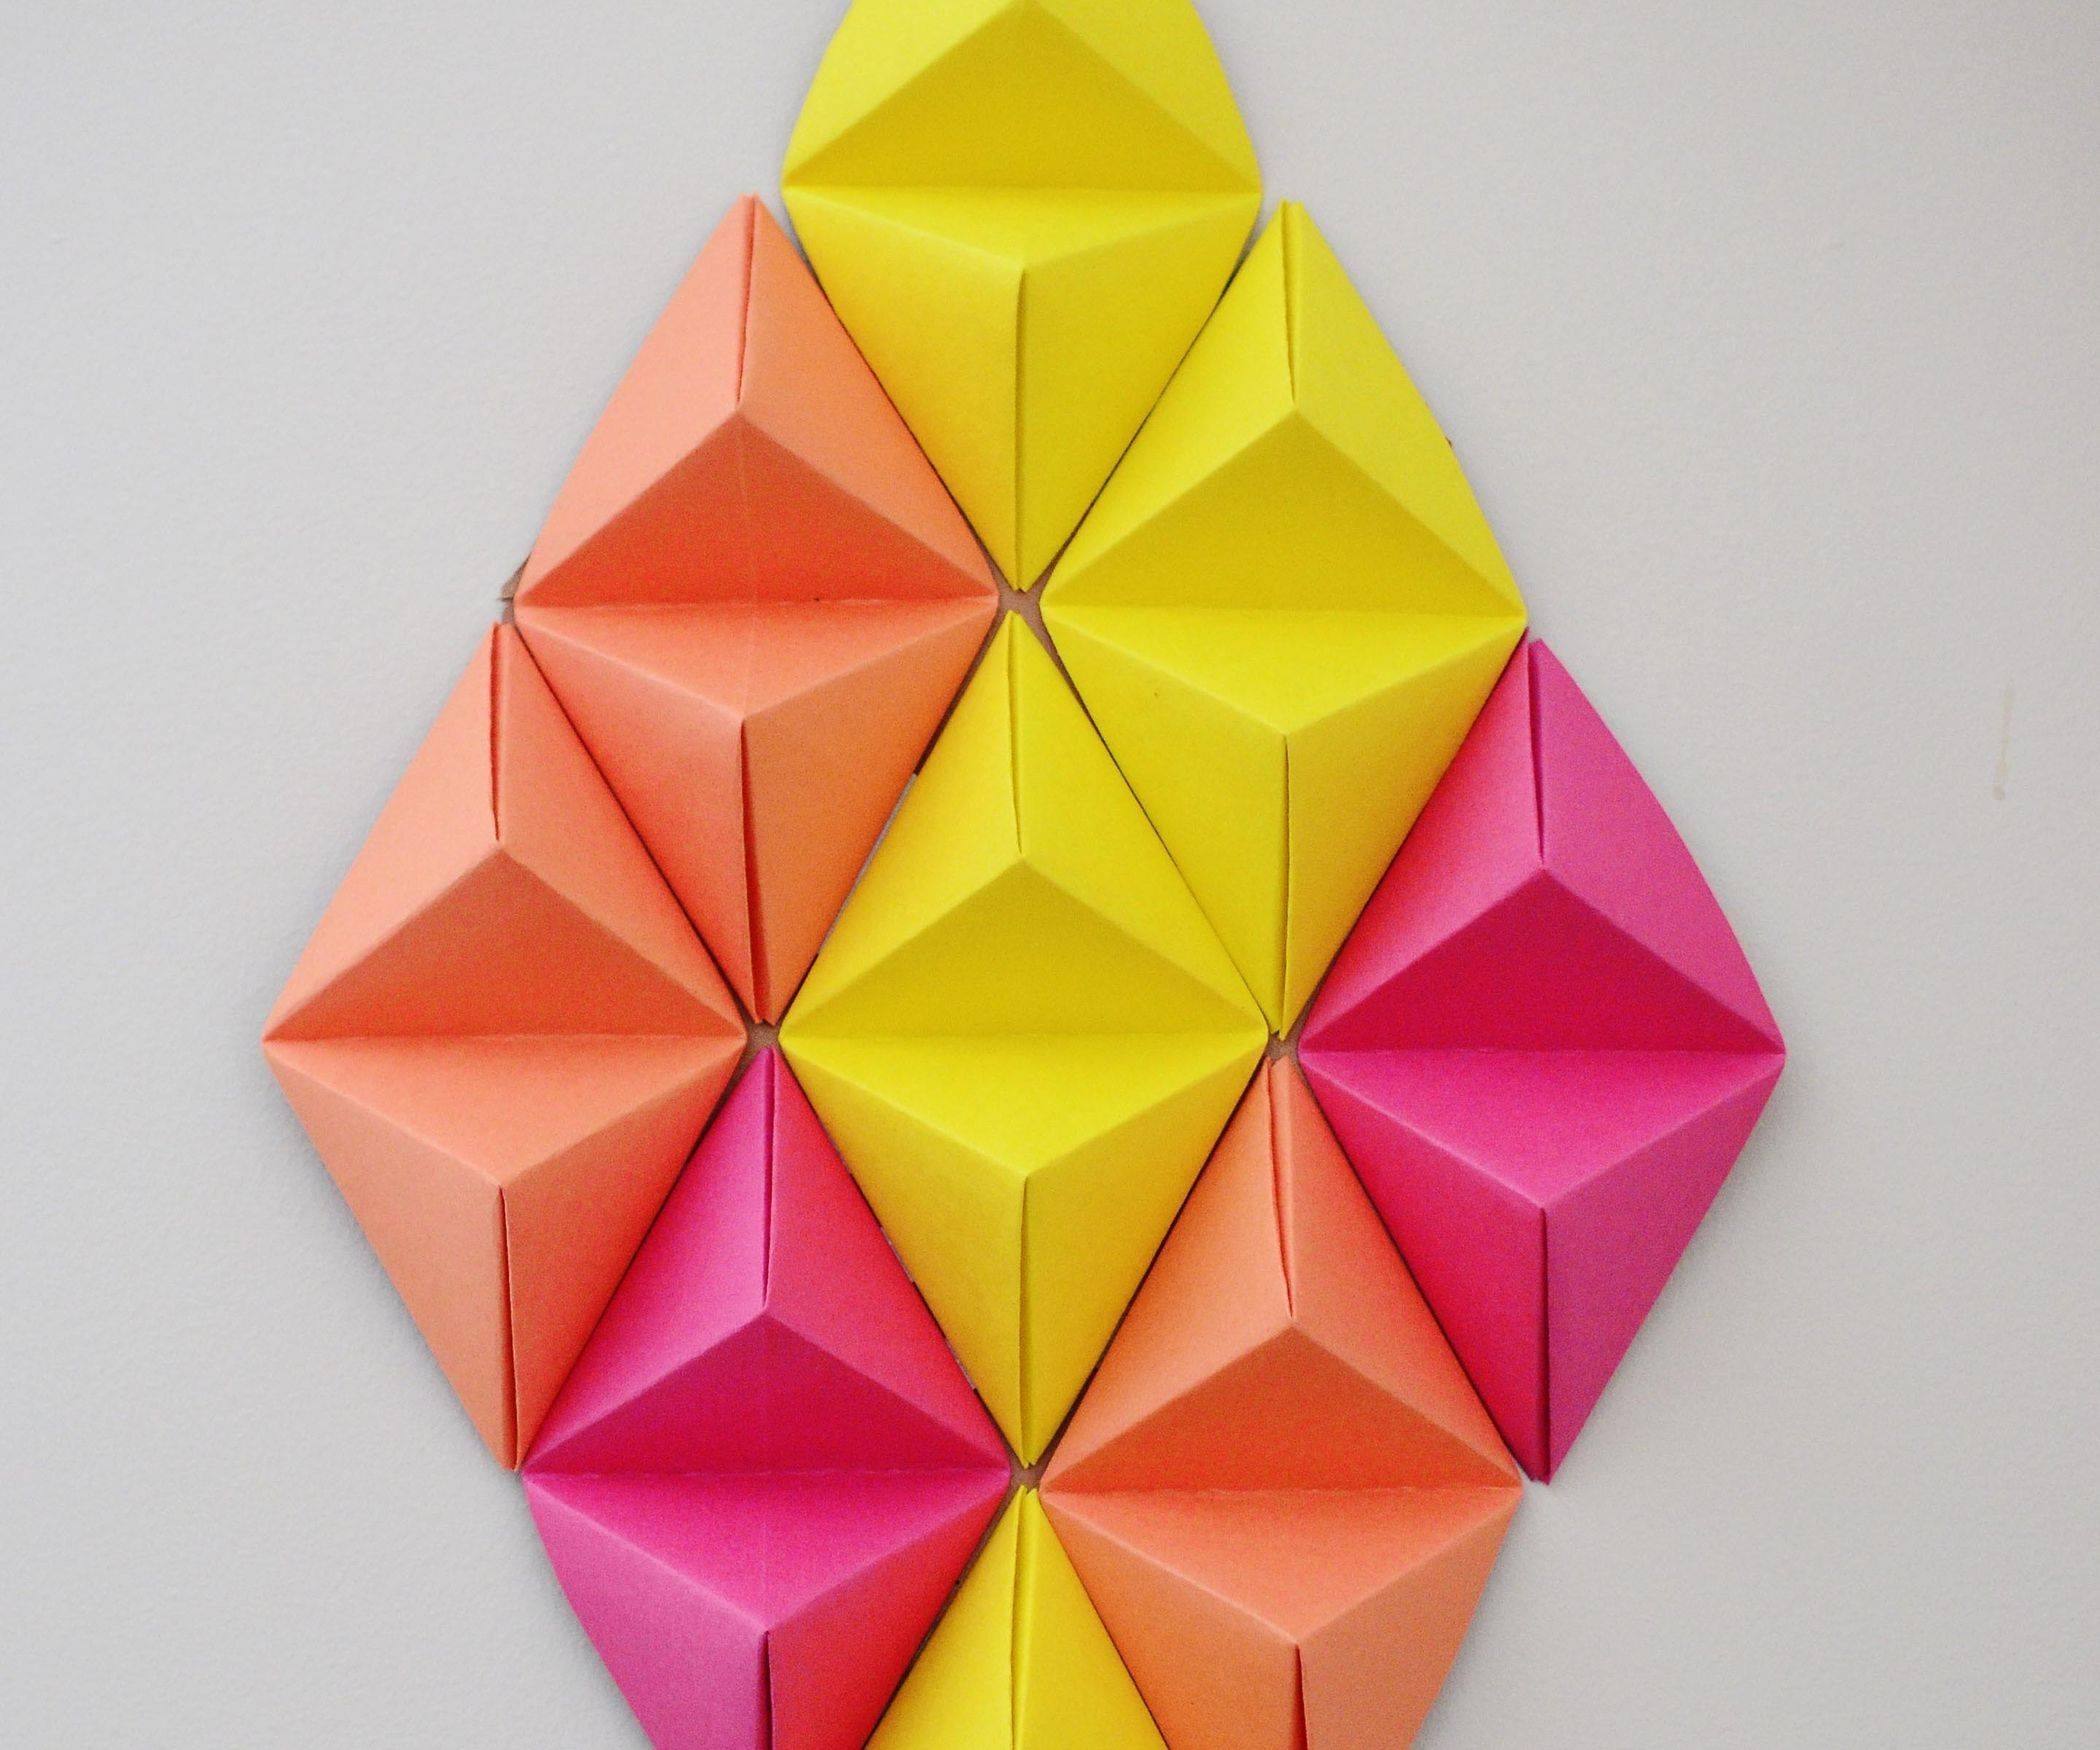 Beautiful Wall Art With Paper Embellishment - Art & Wall Decor ...